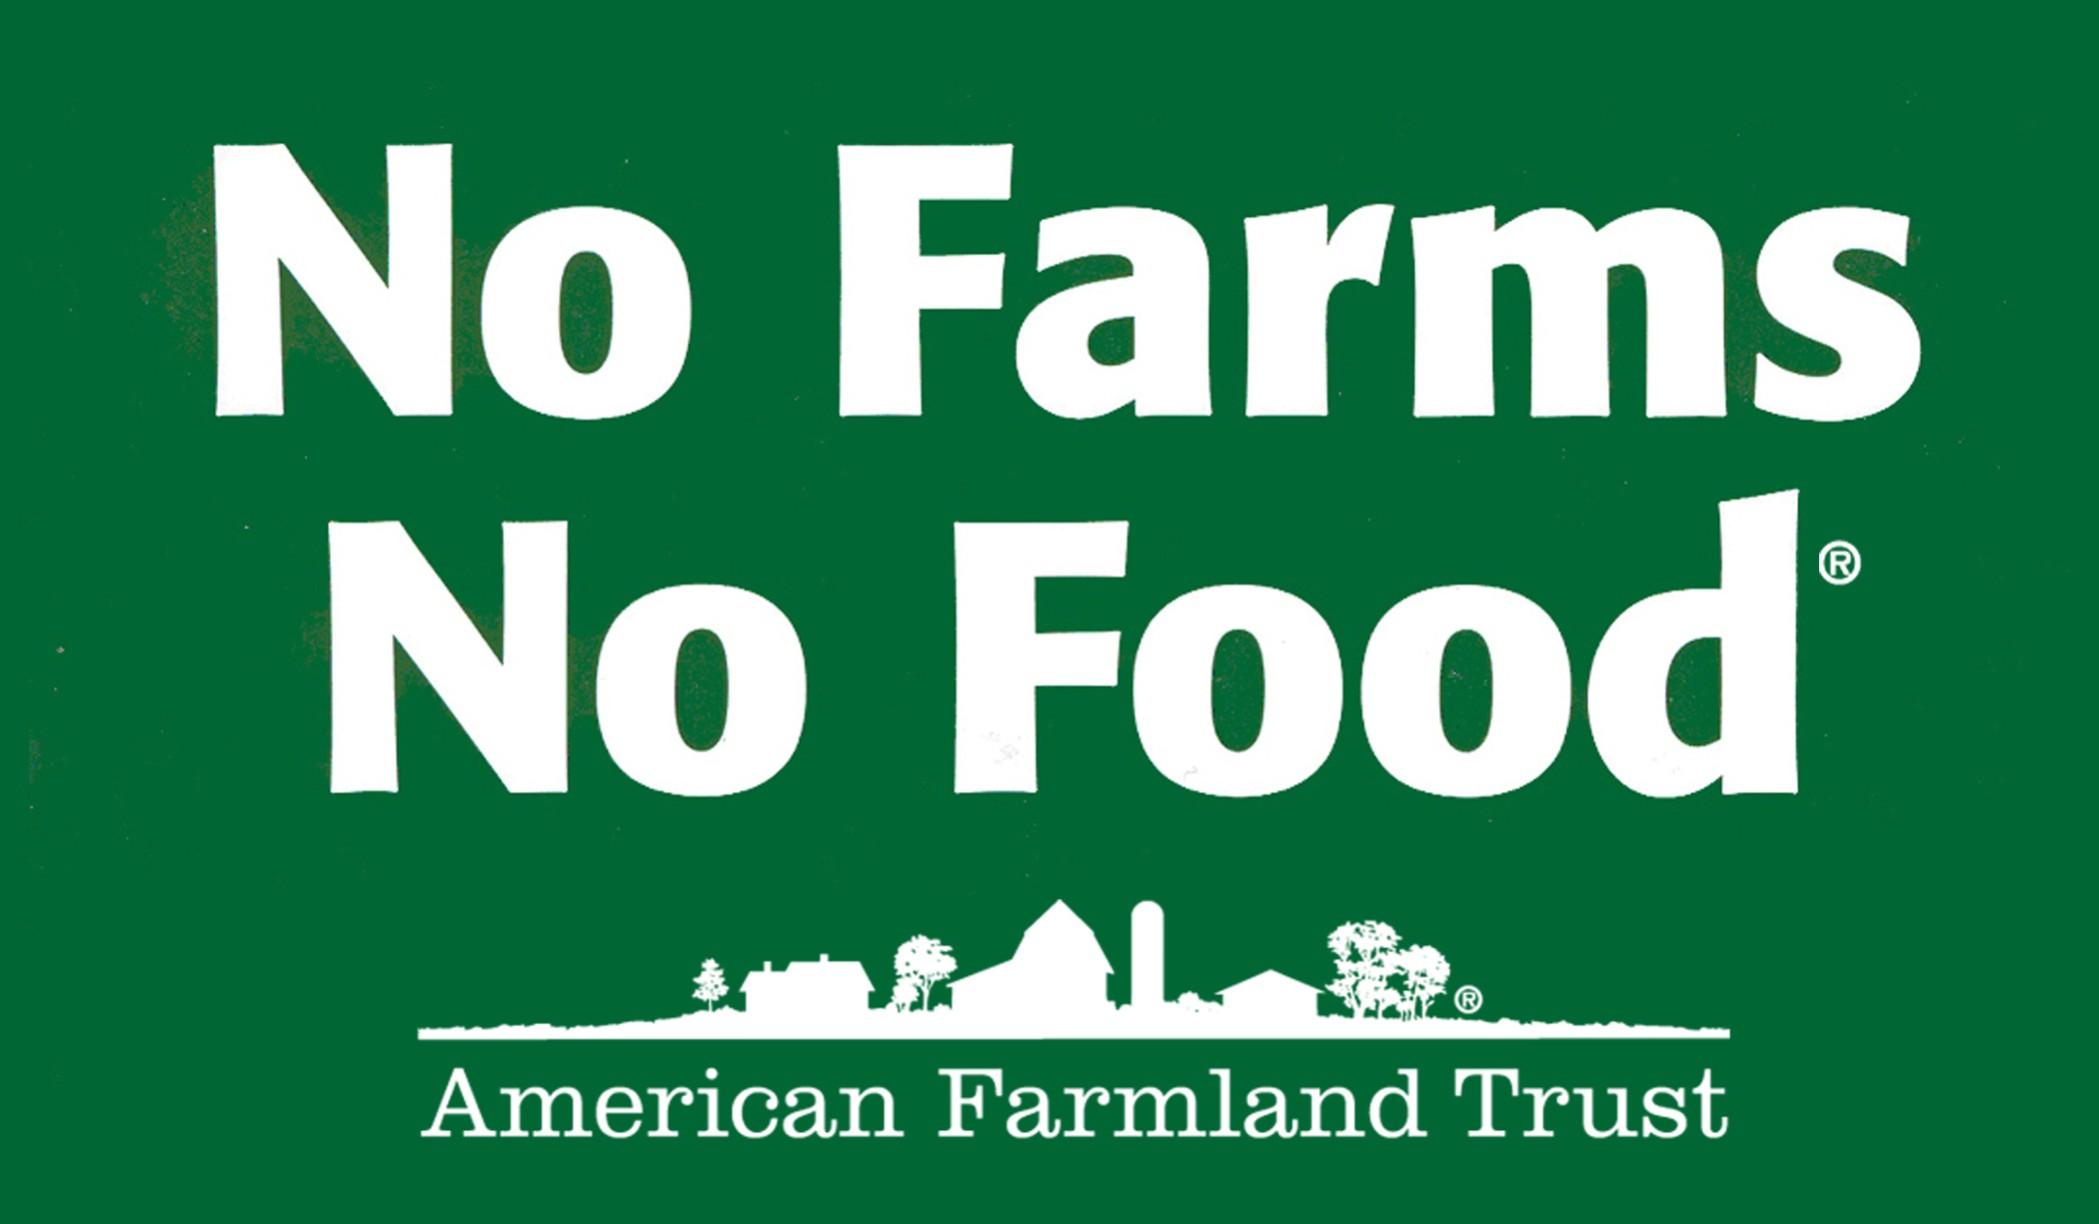 No Farms, No Food Bumper Sticker Sign Up page